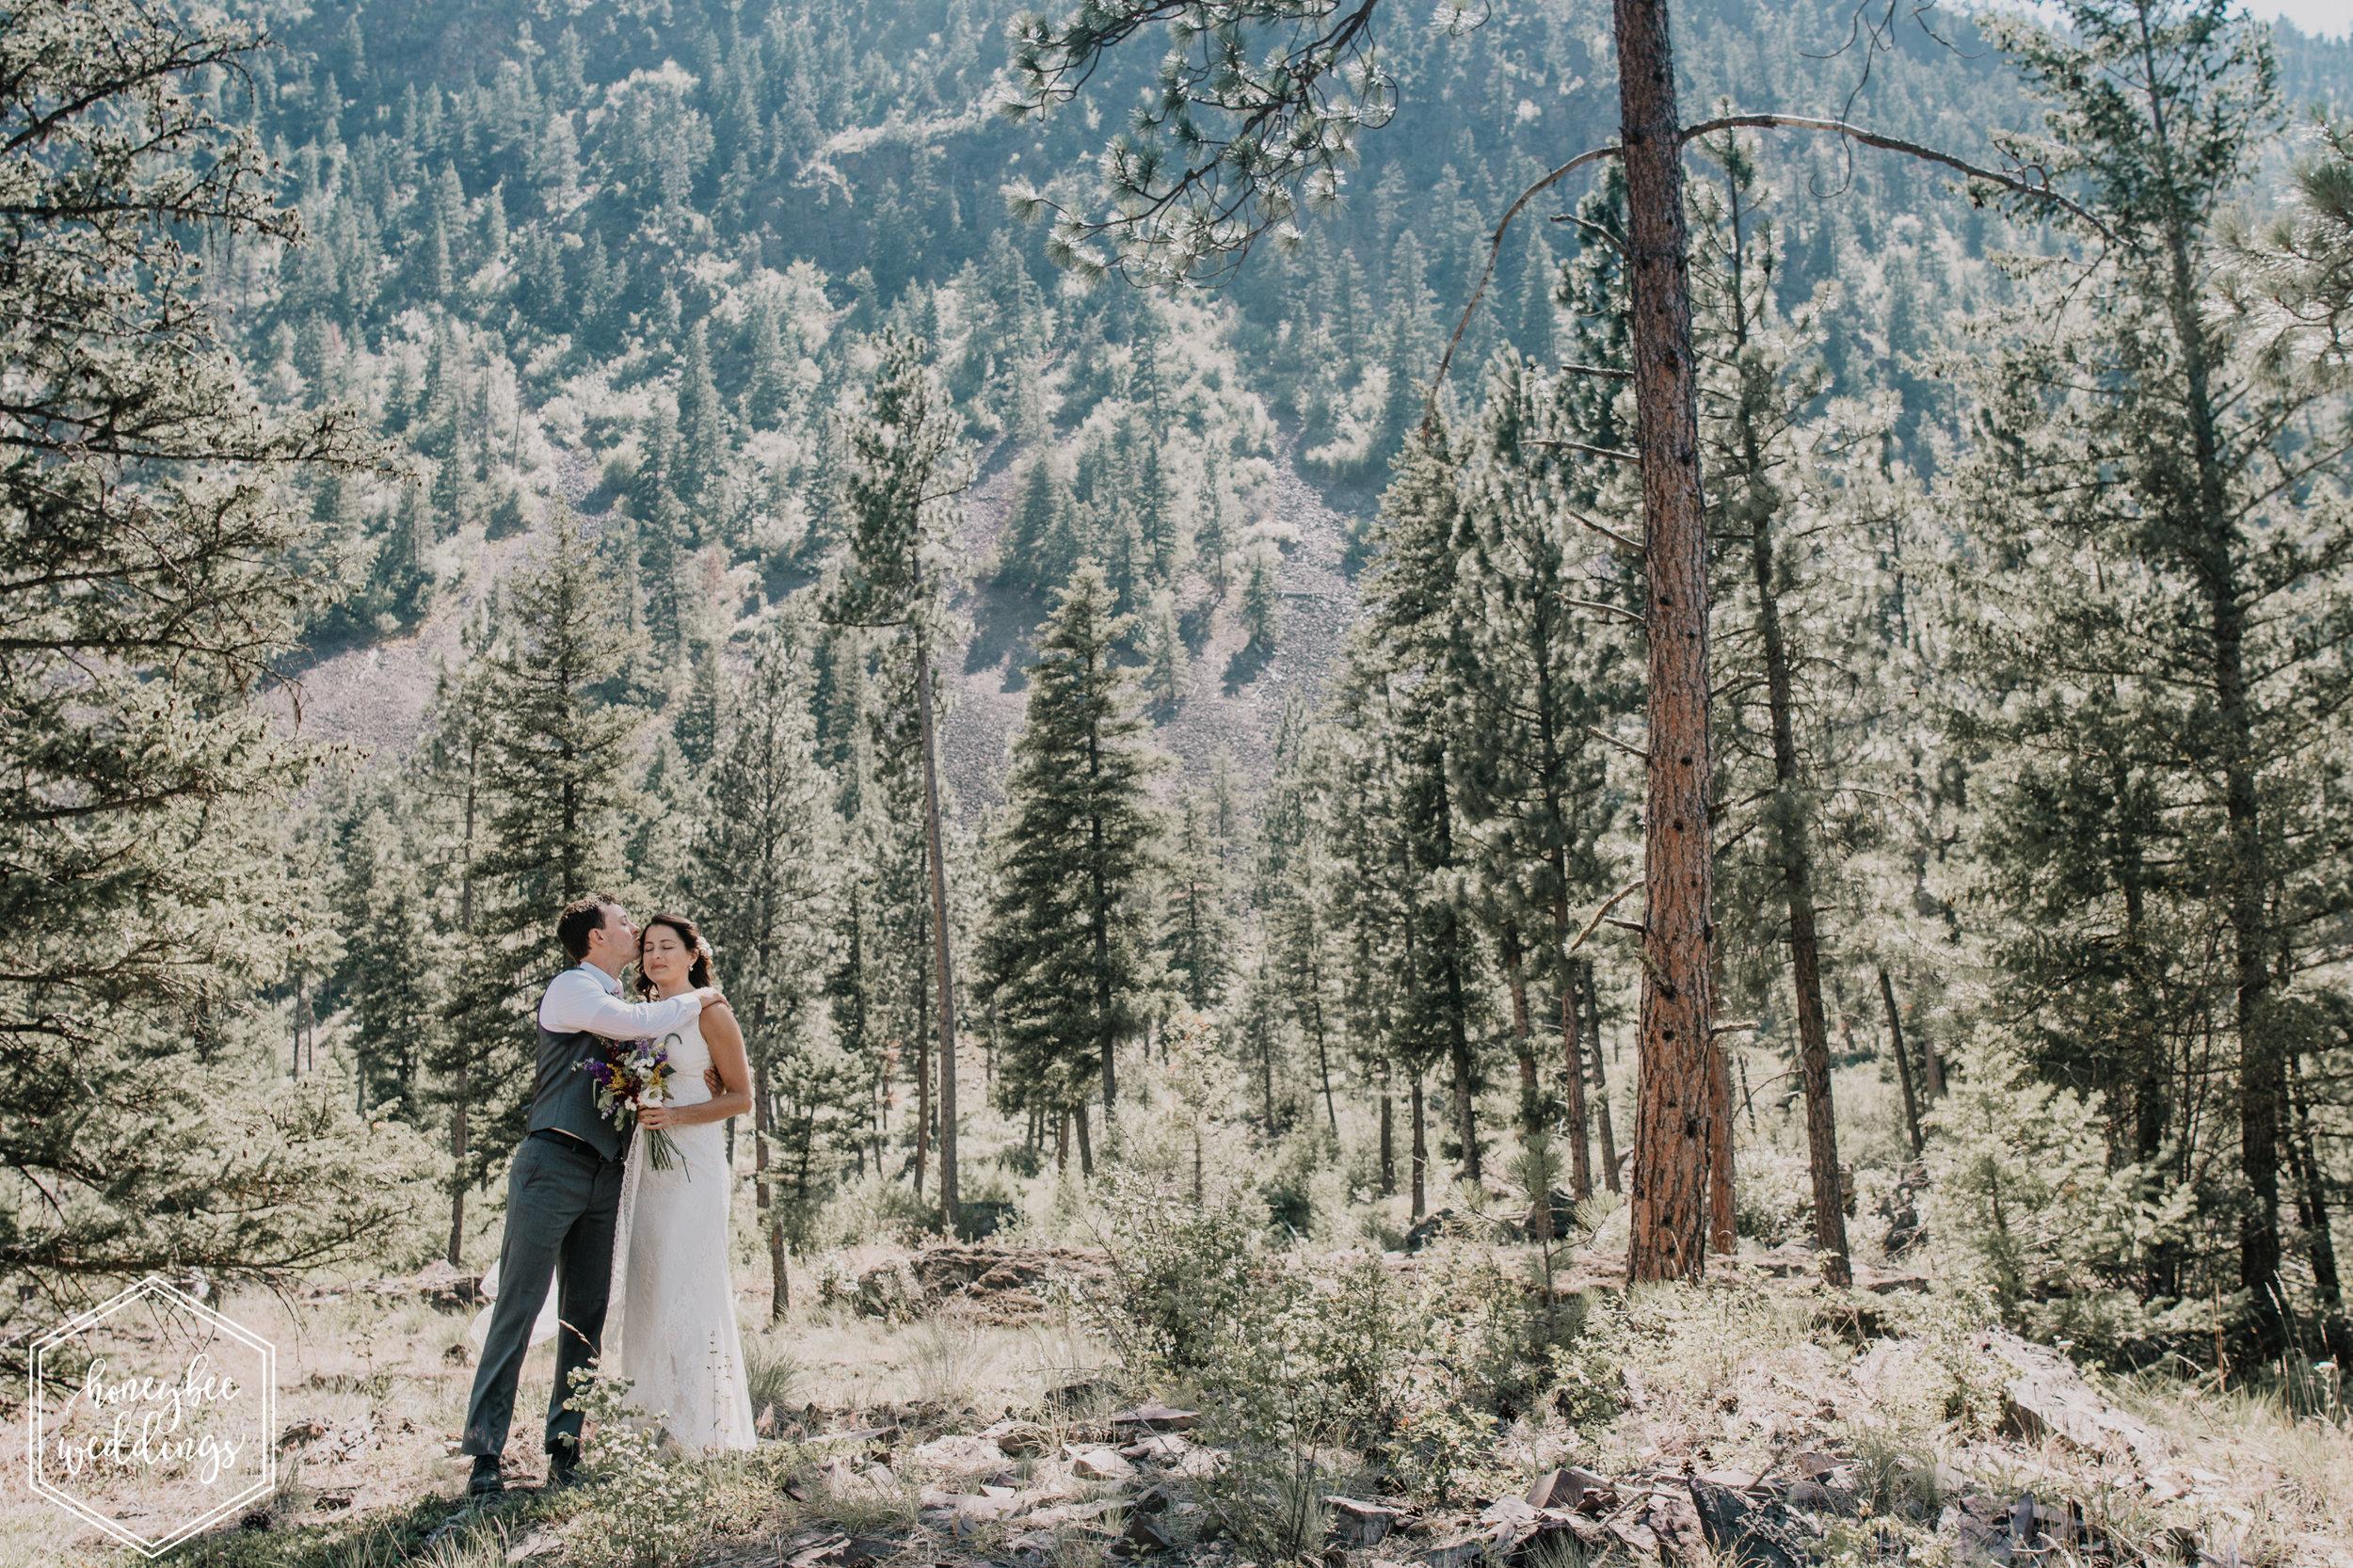 176 White Raven Wedding_Montana Wedding Photographer_Honeybee Weddings_ Meghan Maloney + Arza Hammond 2018-9290-2.jpg